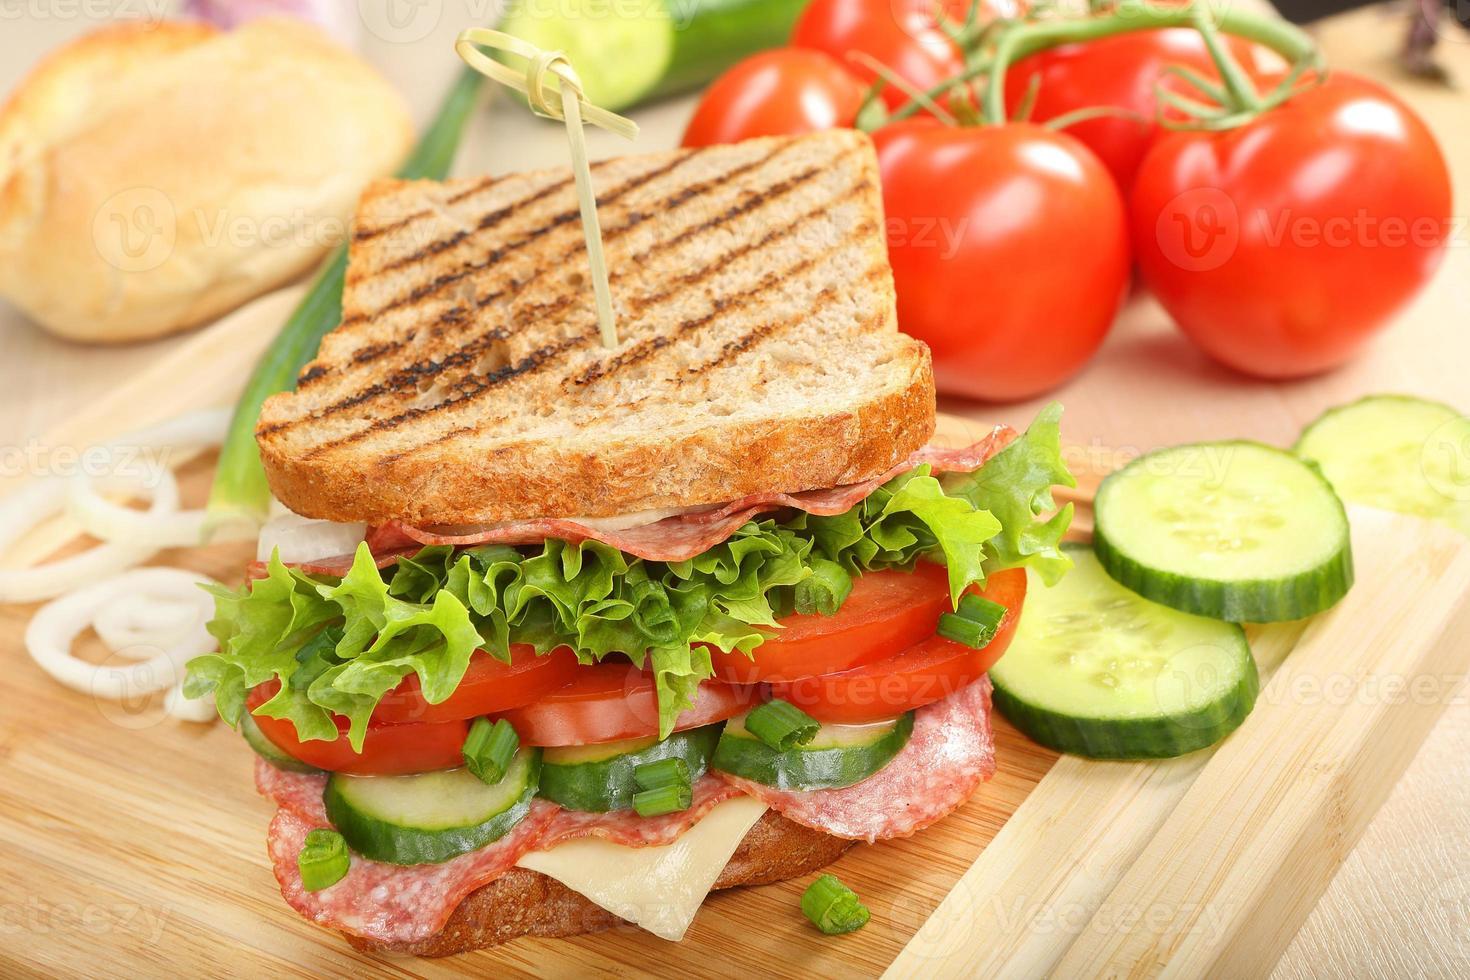 sandwich met kaas en salami op houten achtergrond foto